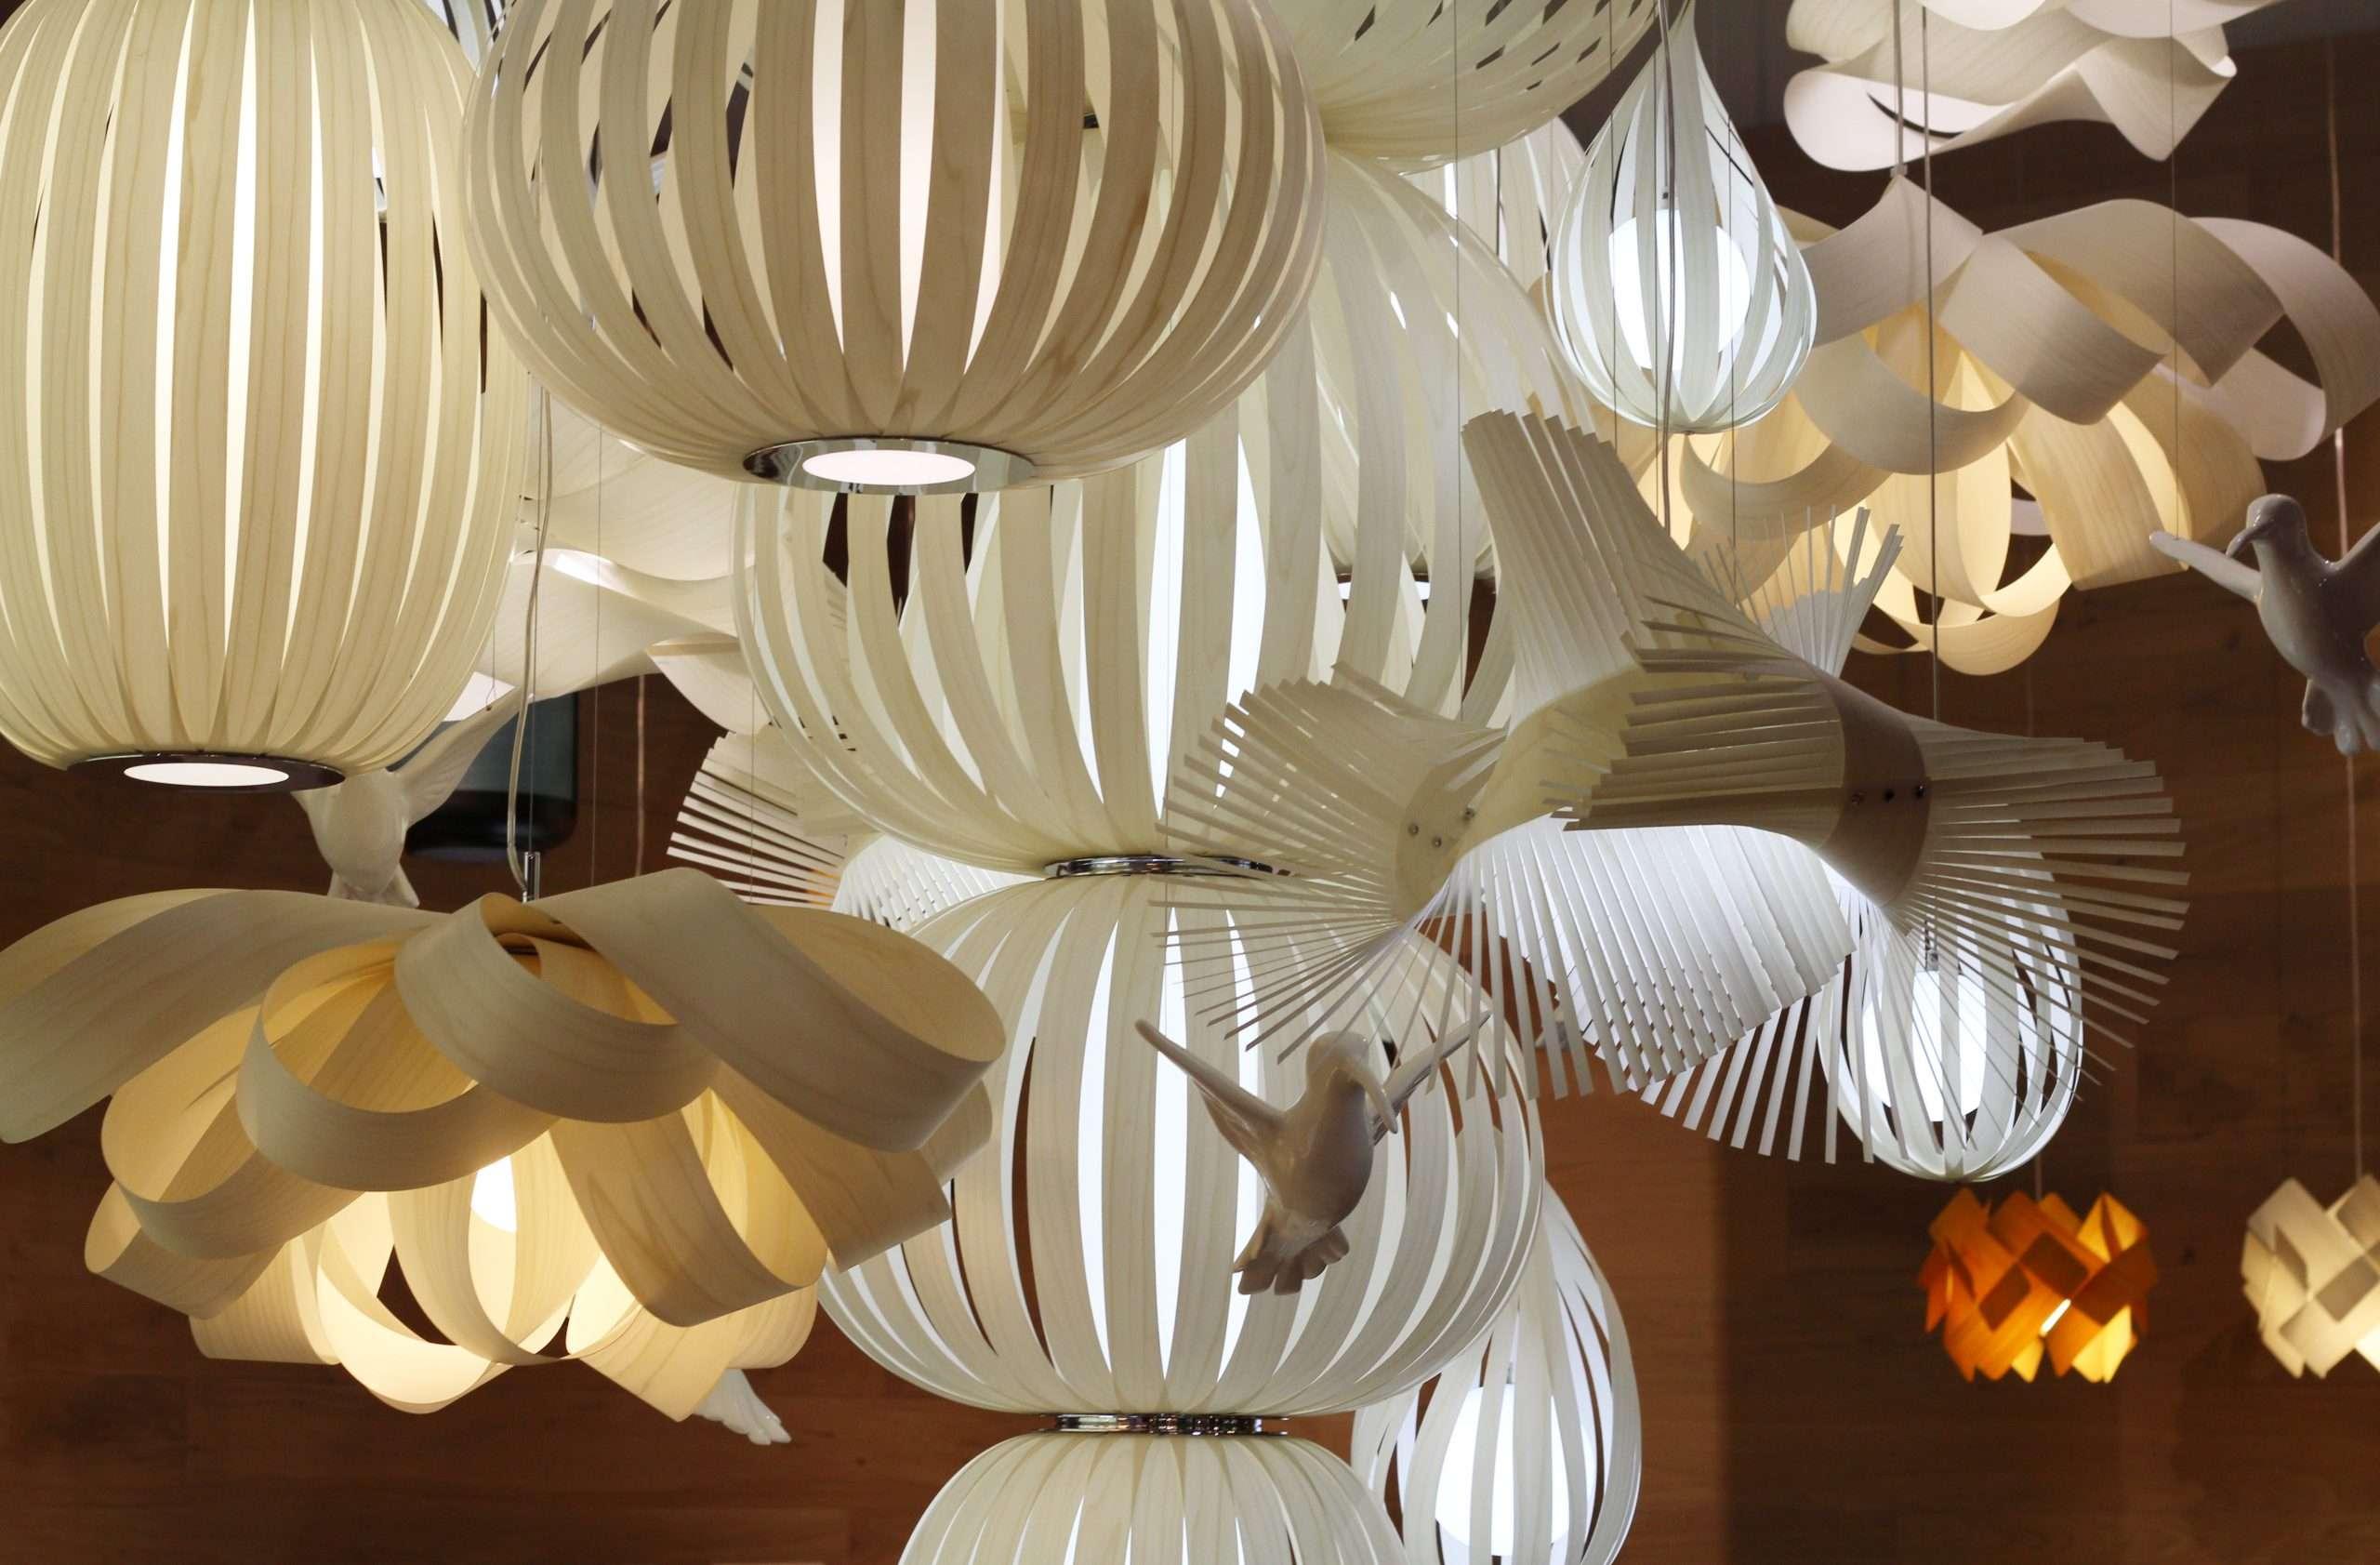 Oliva iluminación, iluminación, smart home, LED, Lighting Designers